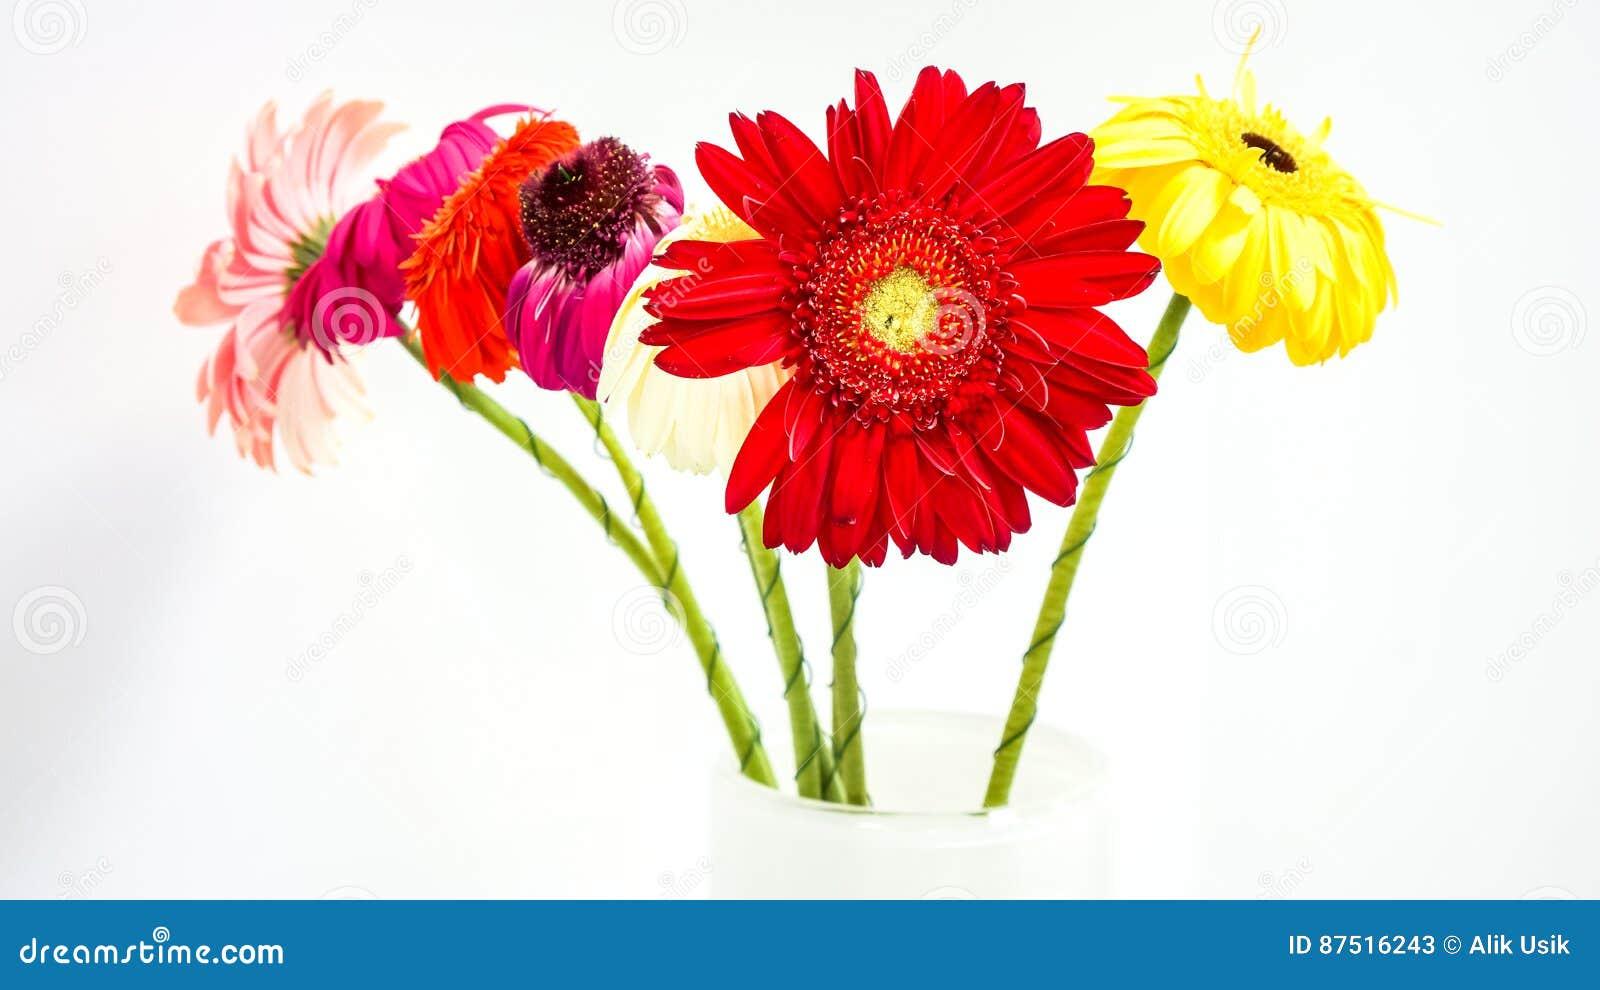 Margaridas coloridas do gerber no fundo branco